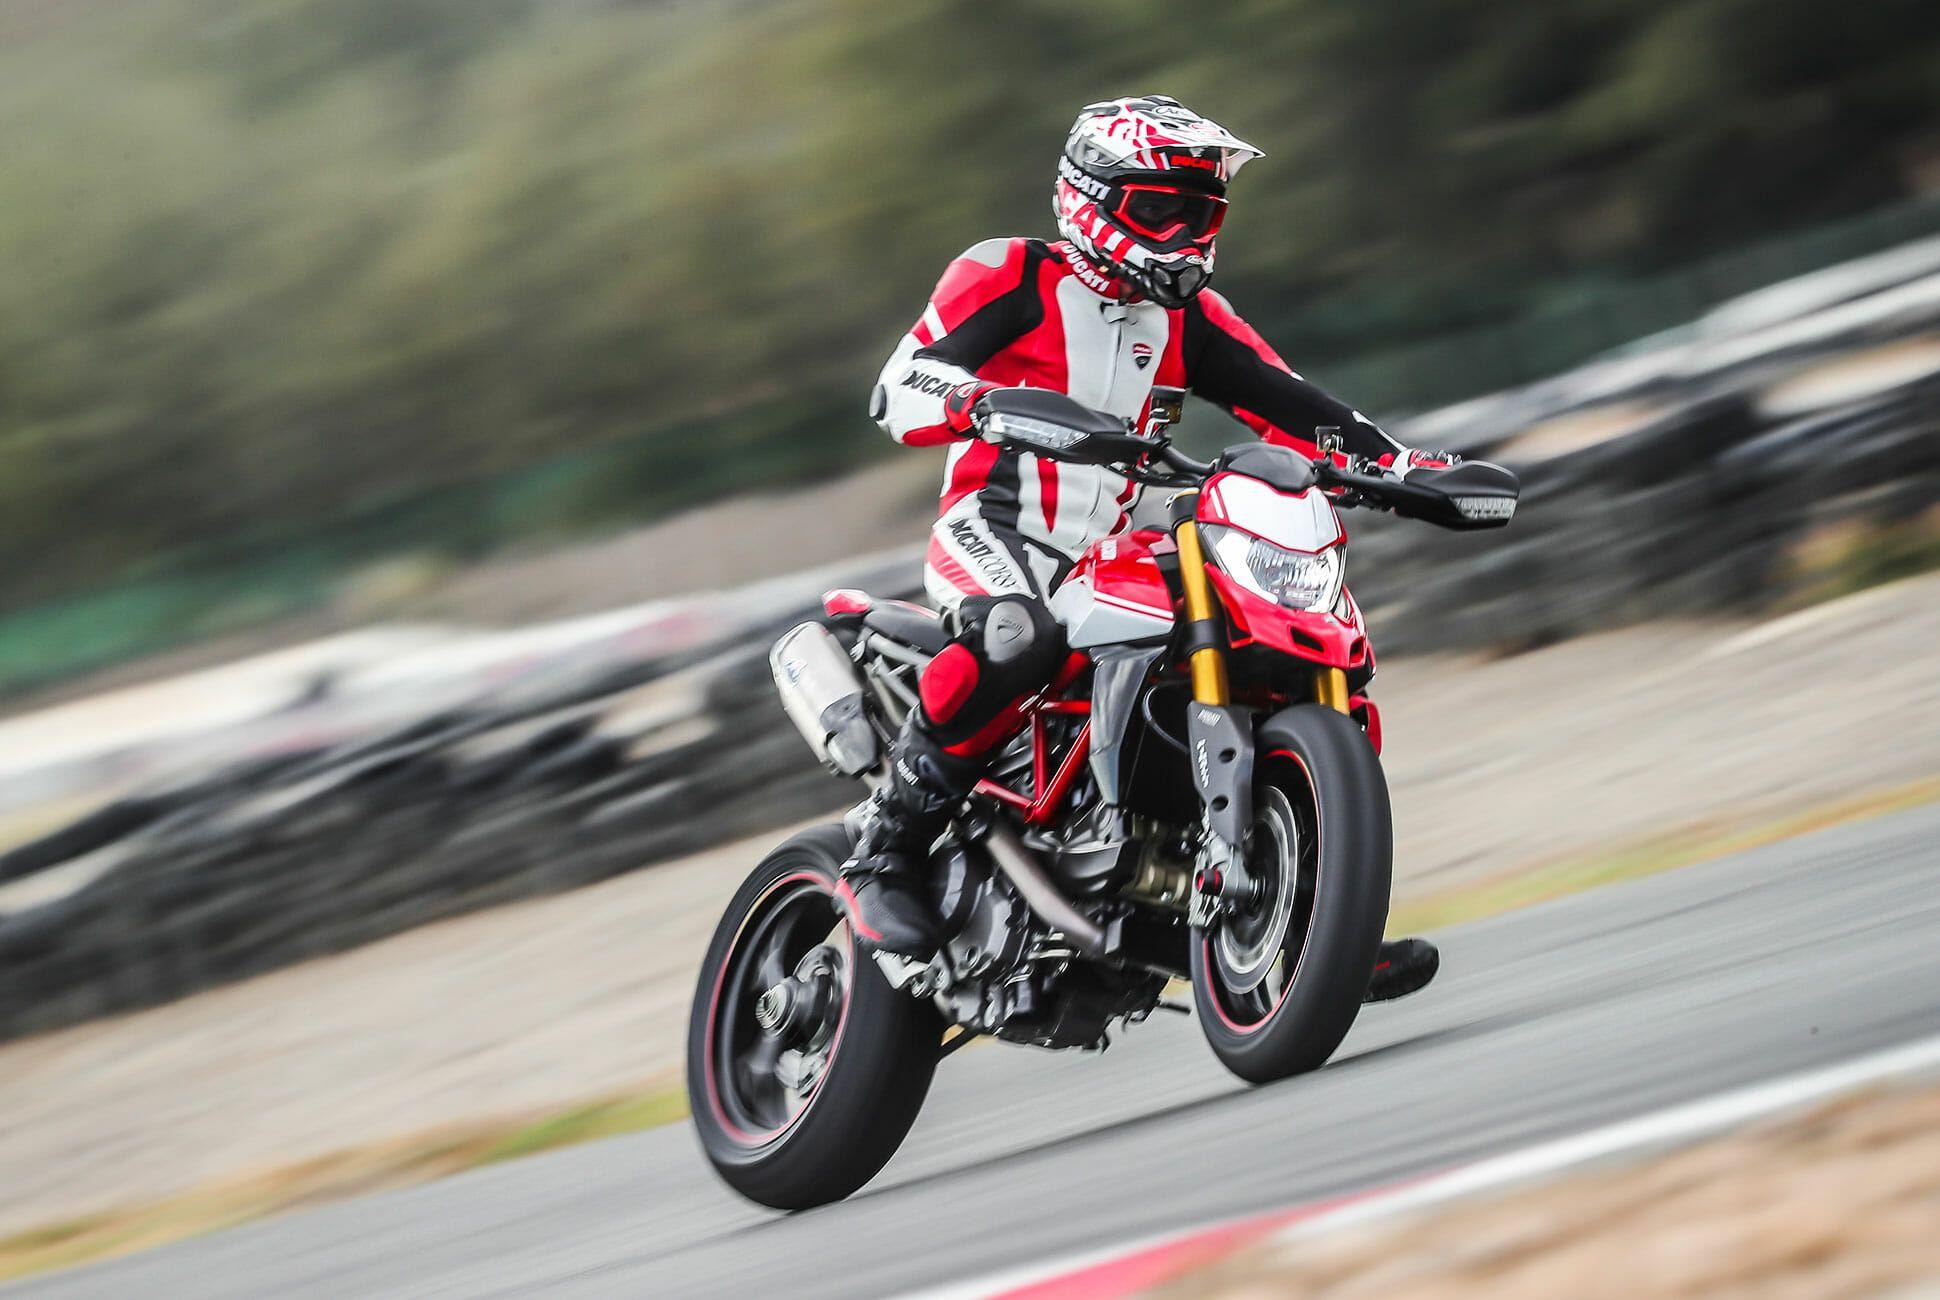 Ducati-Hypermotard-950-SP-Review-gear-patrol-slide-9